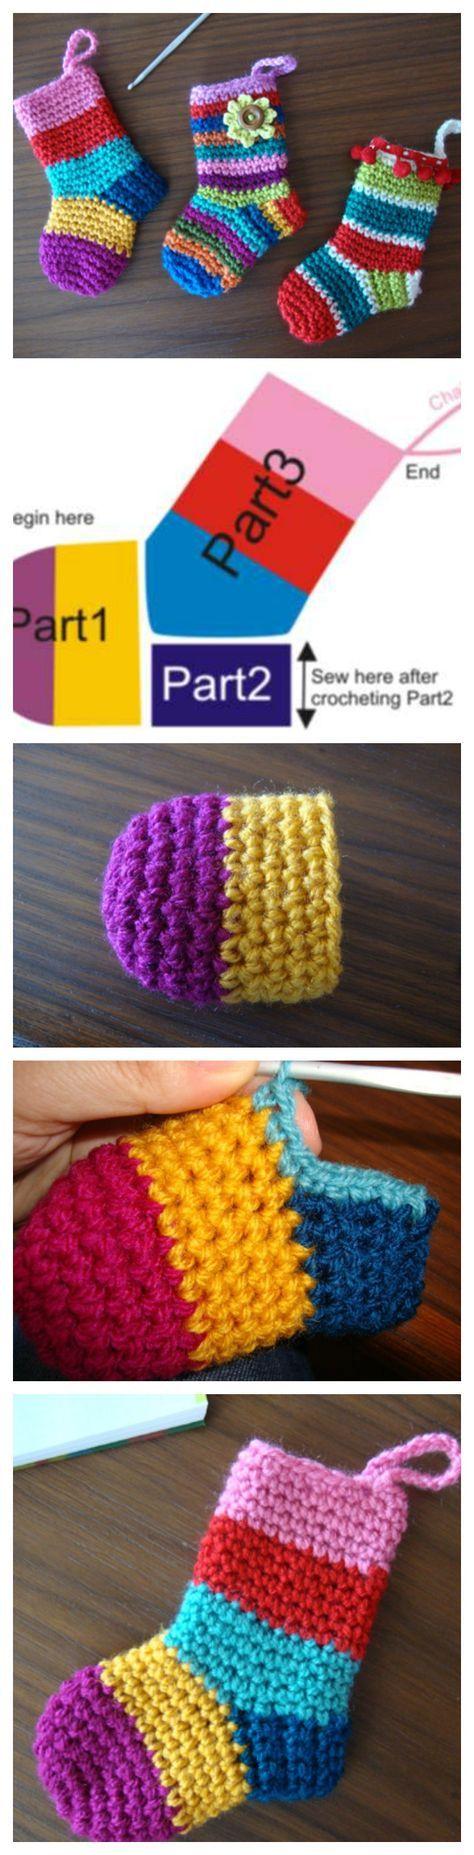 Mini Christmas Stockings Crochet Pattern | Strumpf häkeln, Strümpfe ...